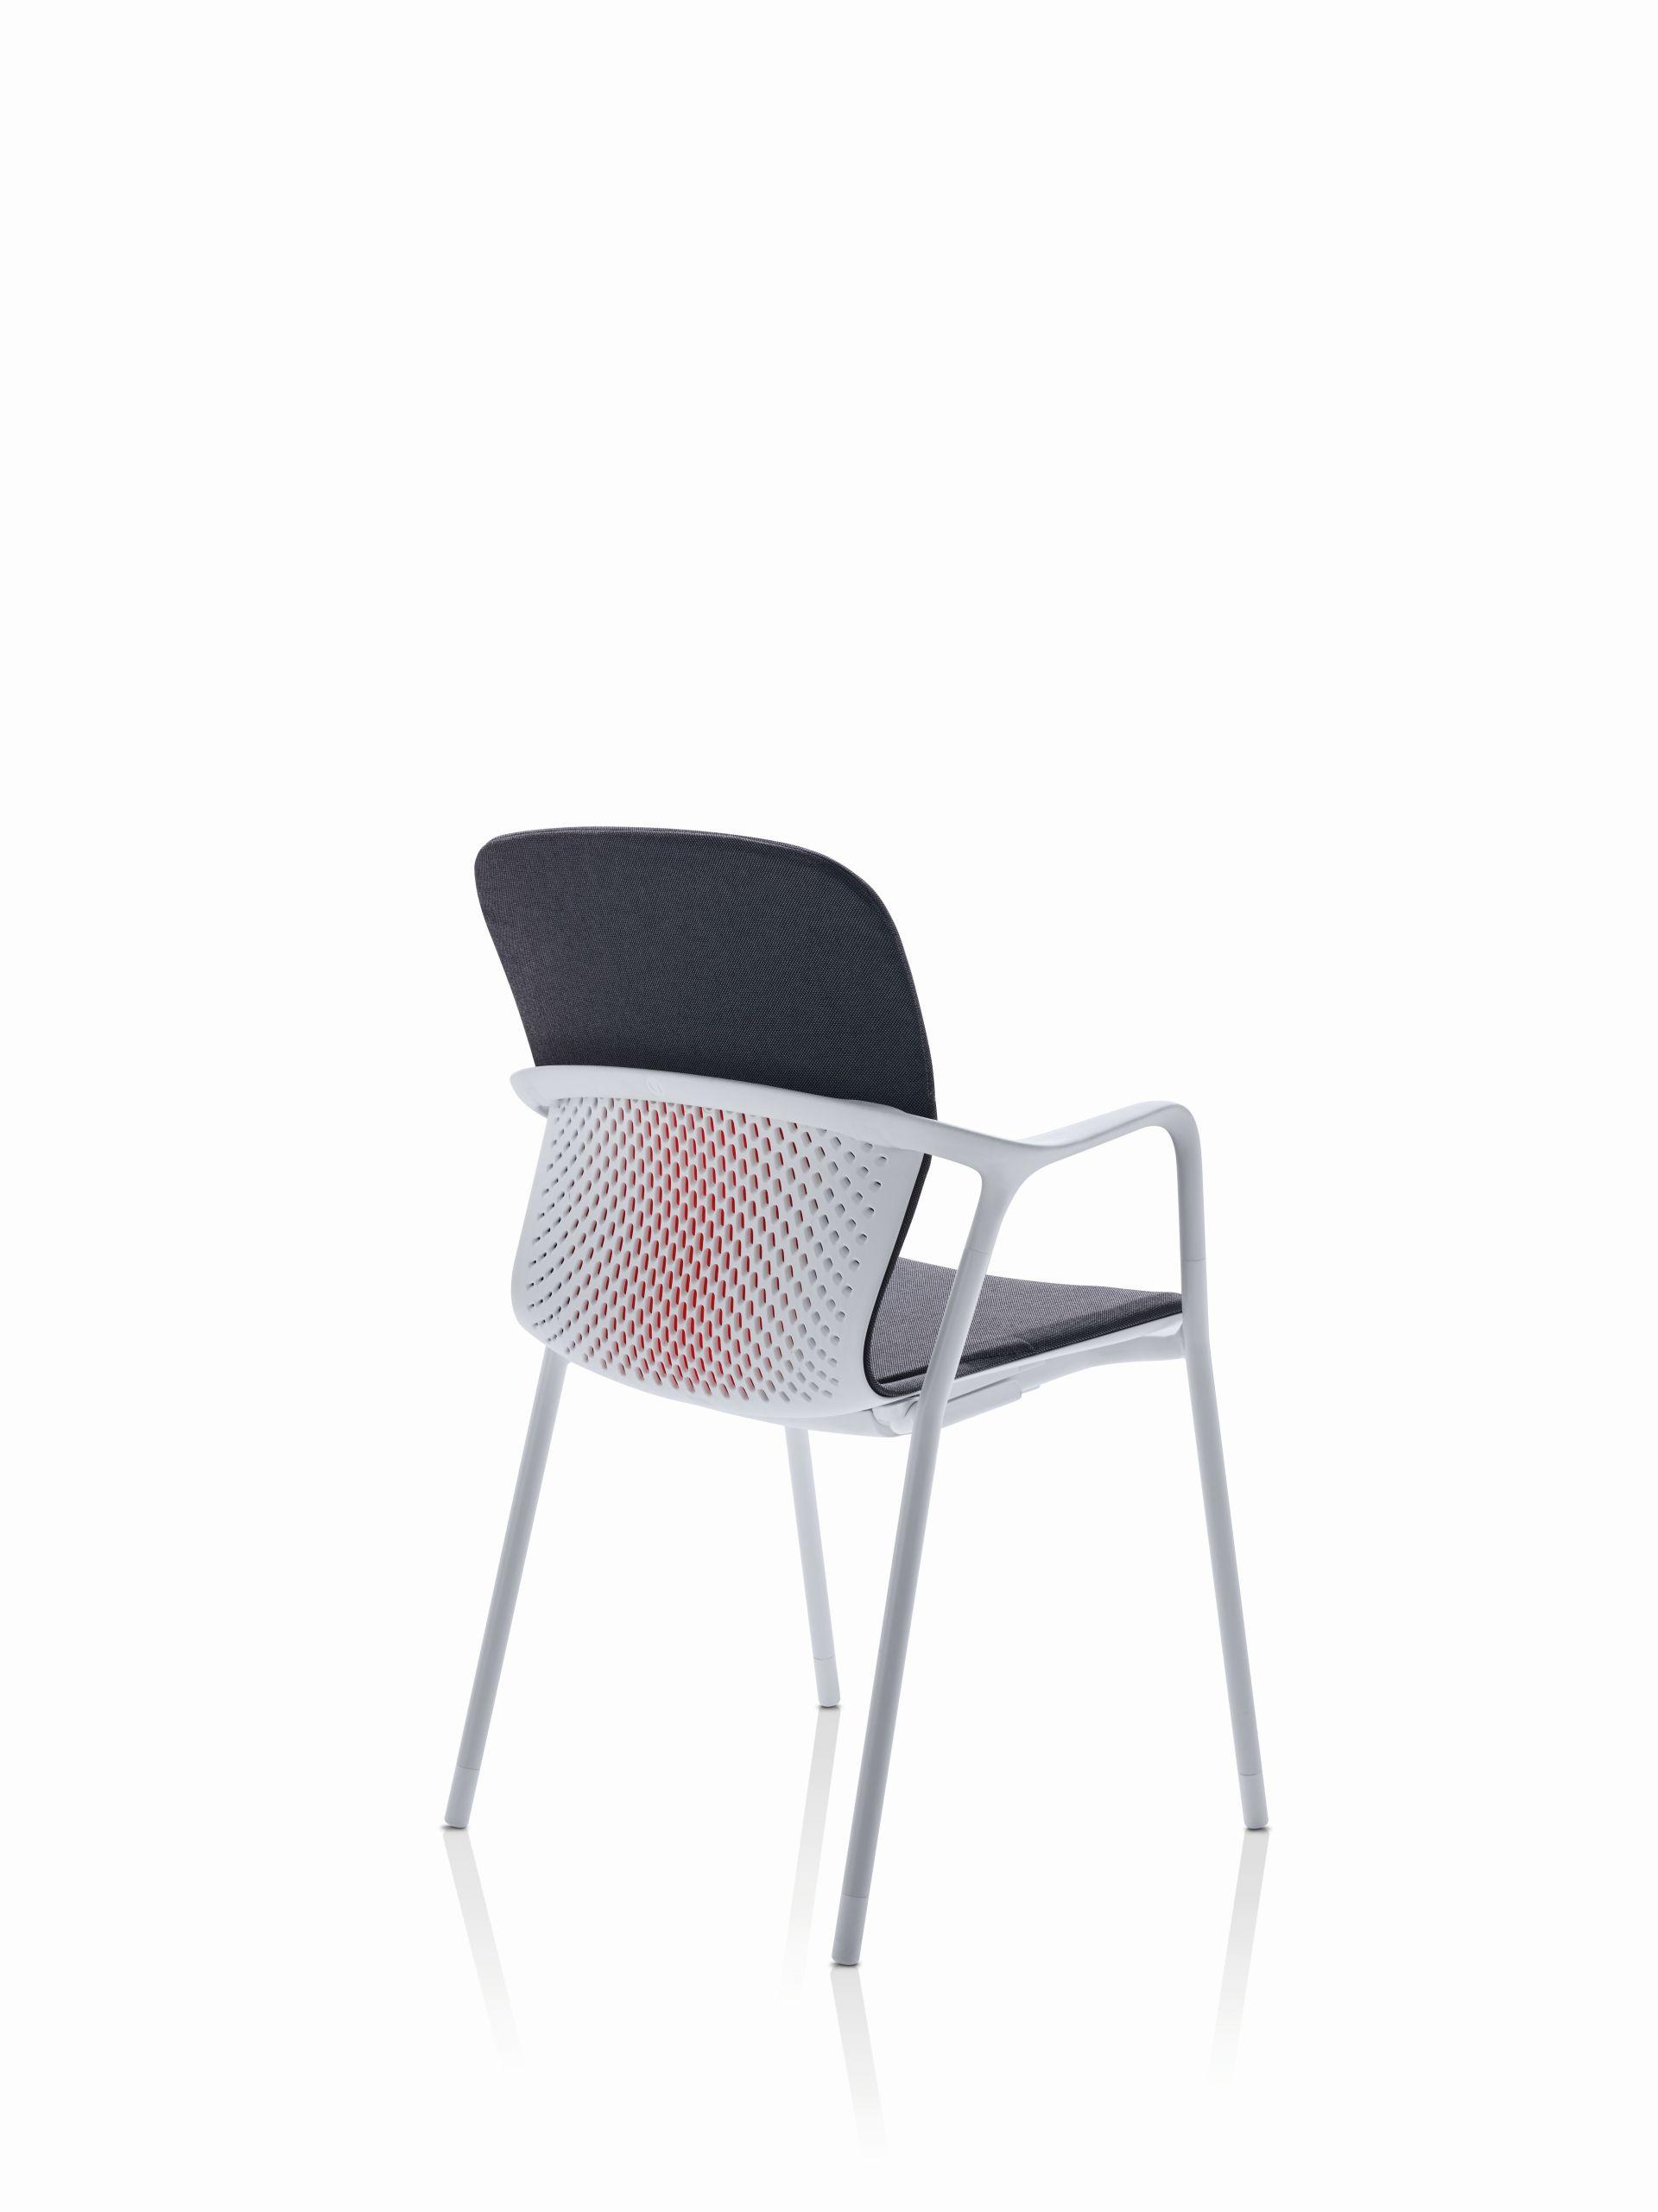 office chair herman miller rail profiles keyn - love that design